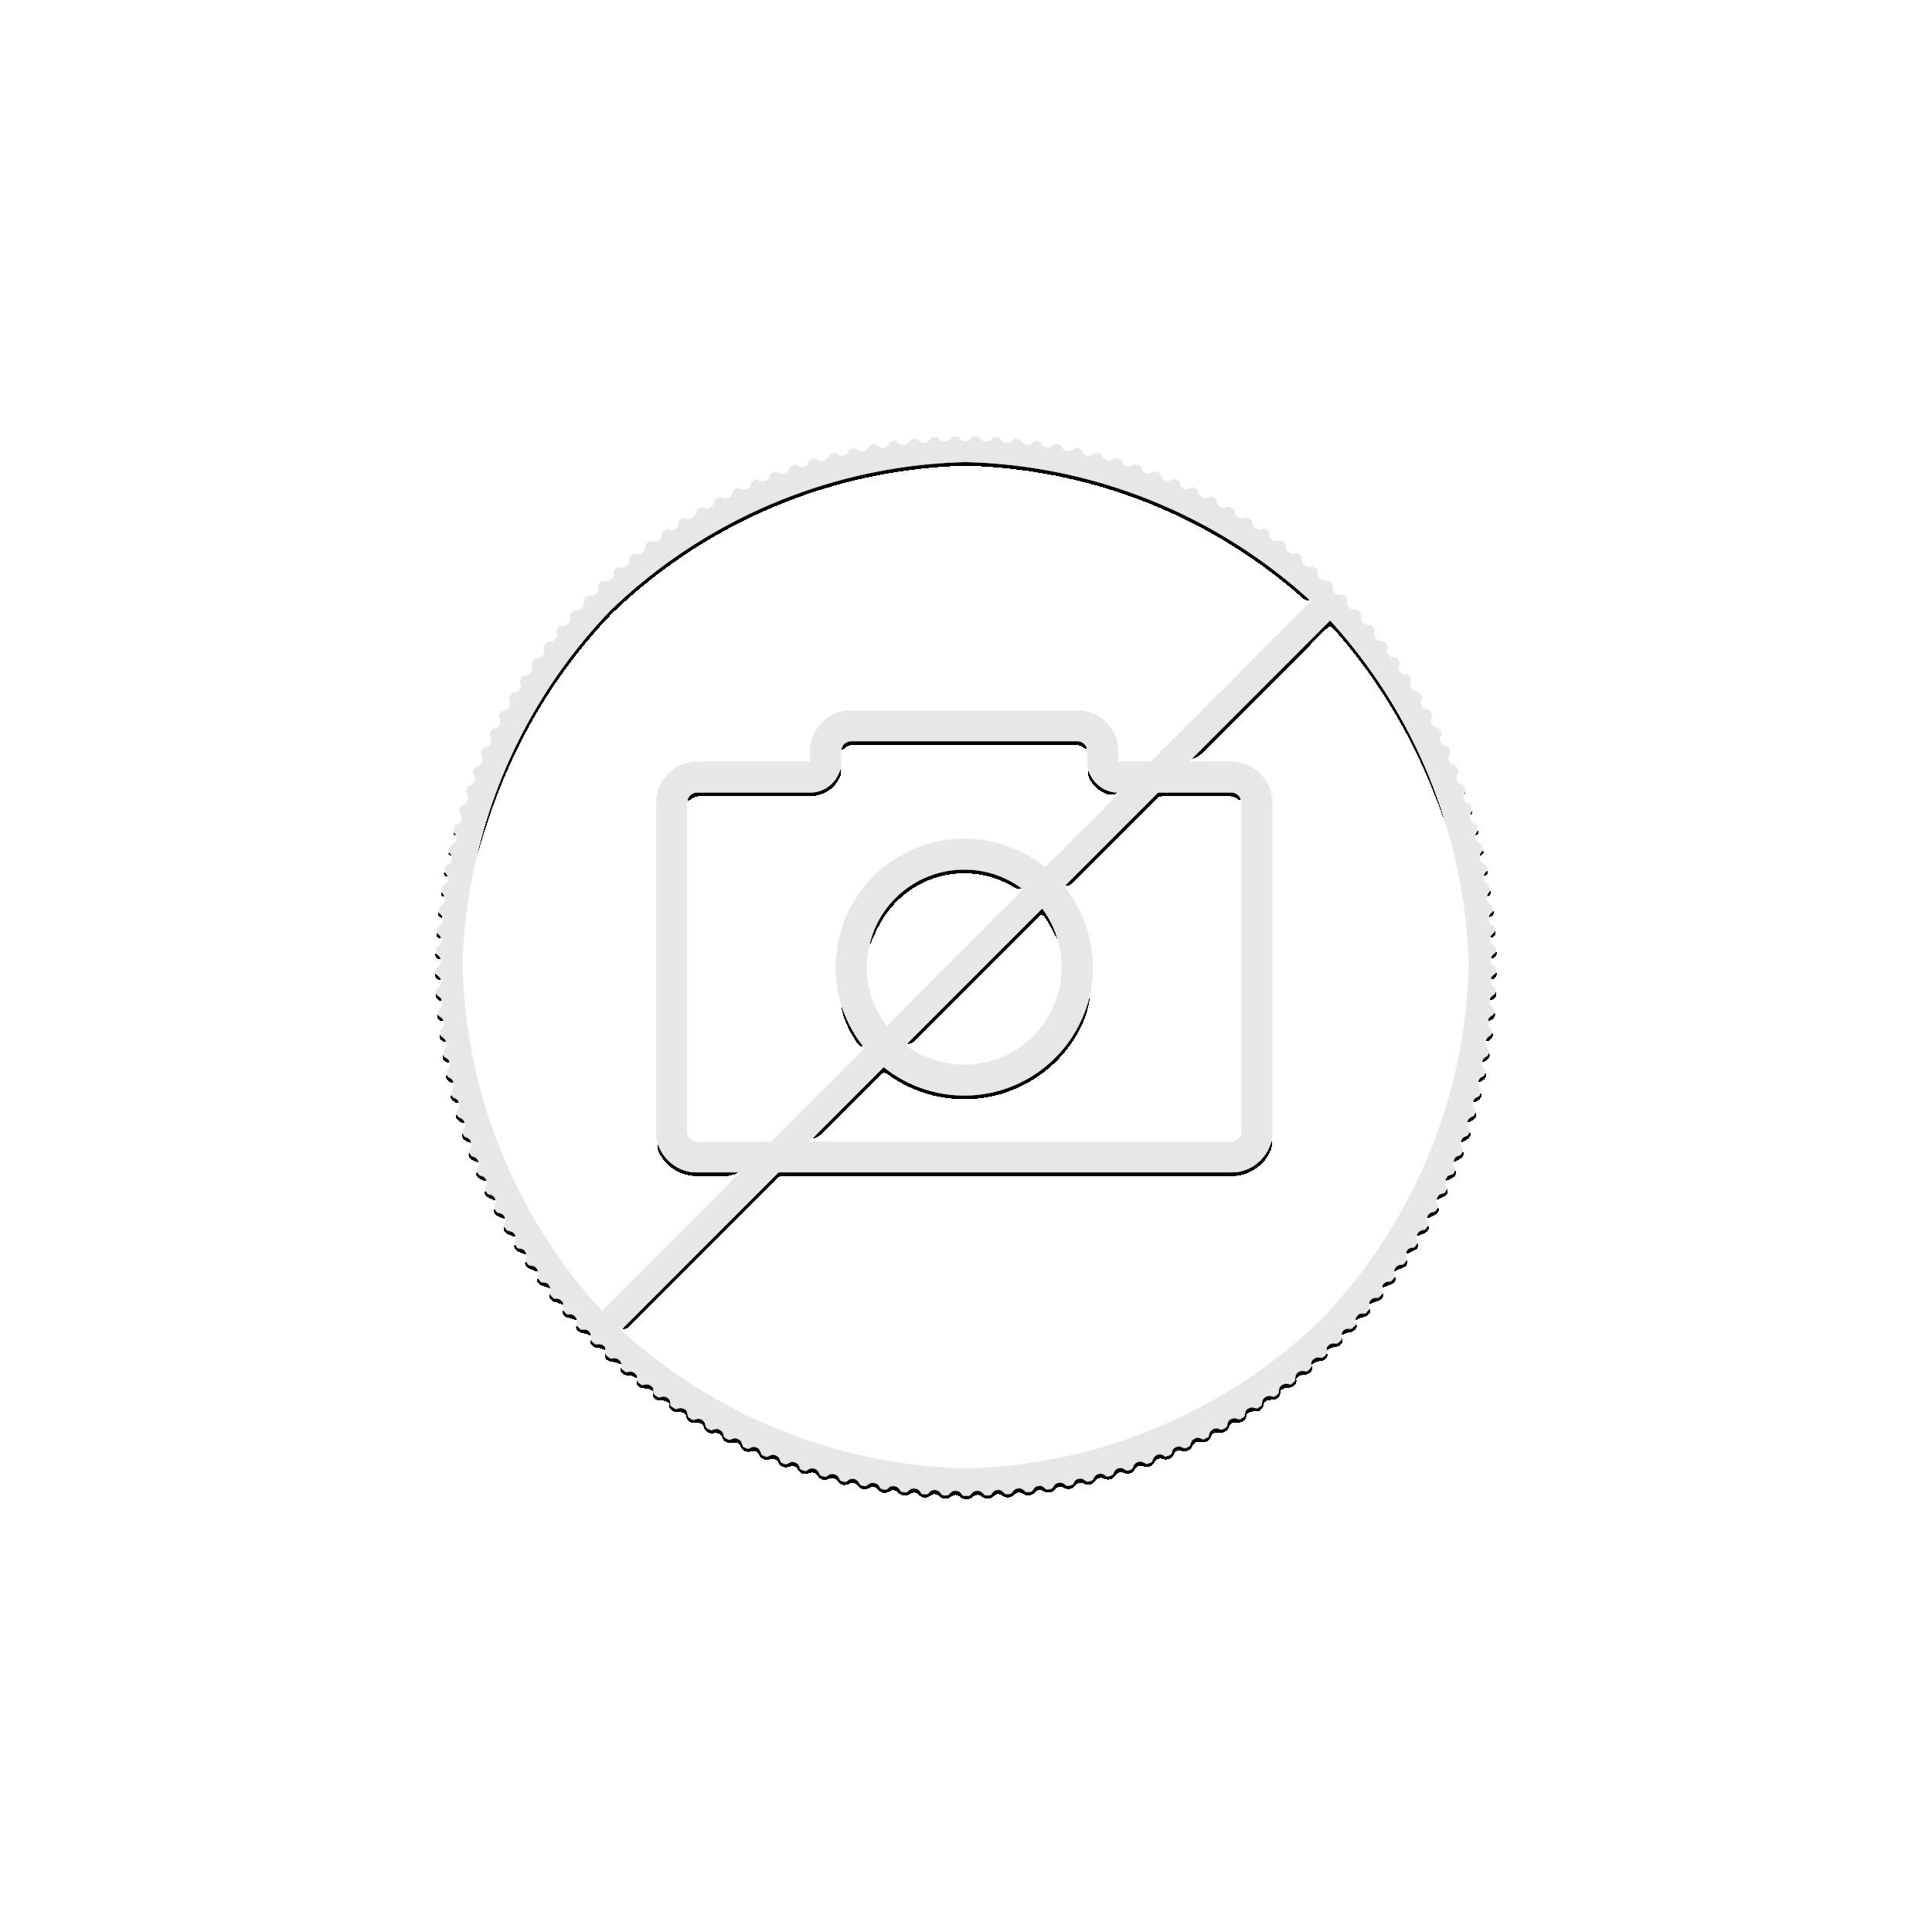 1 Troy ounce zilveren munt Wolf 2018 - Predator serie